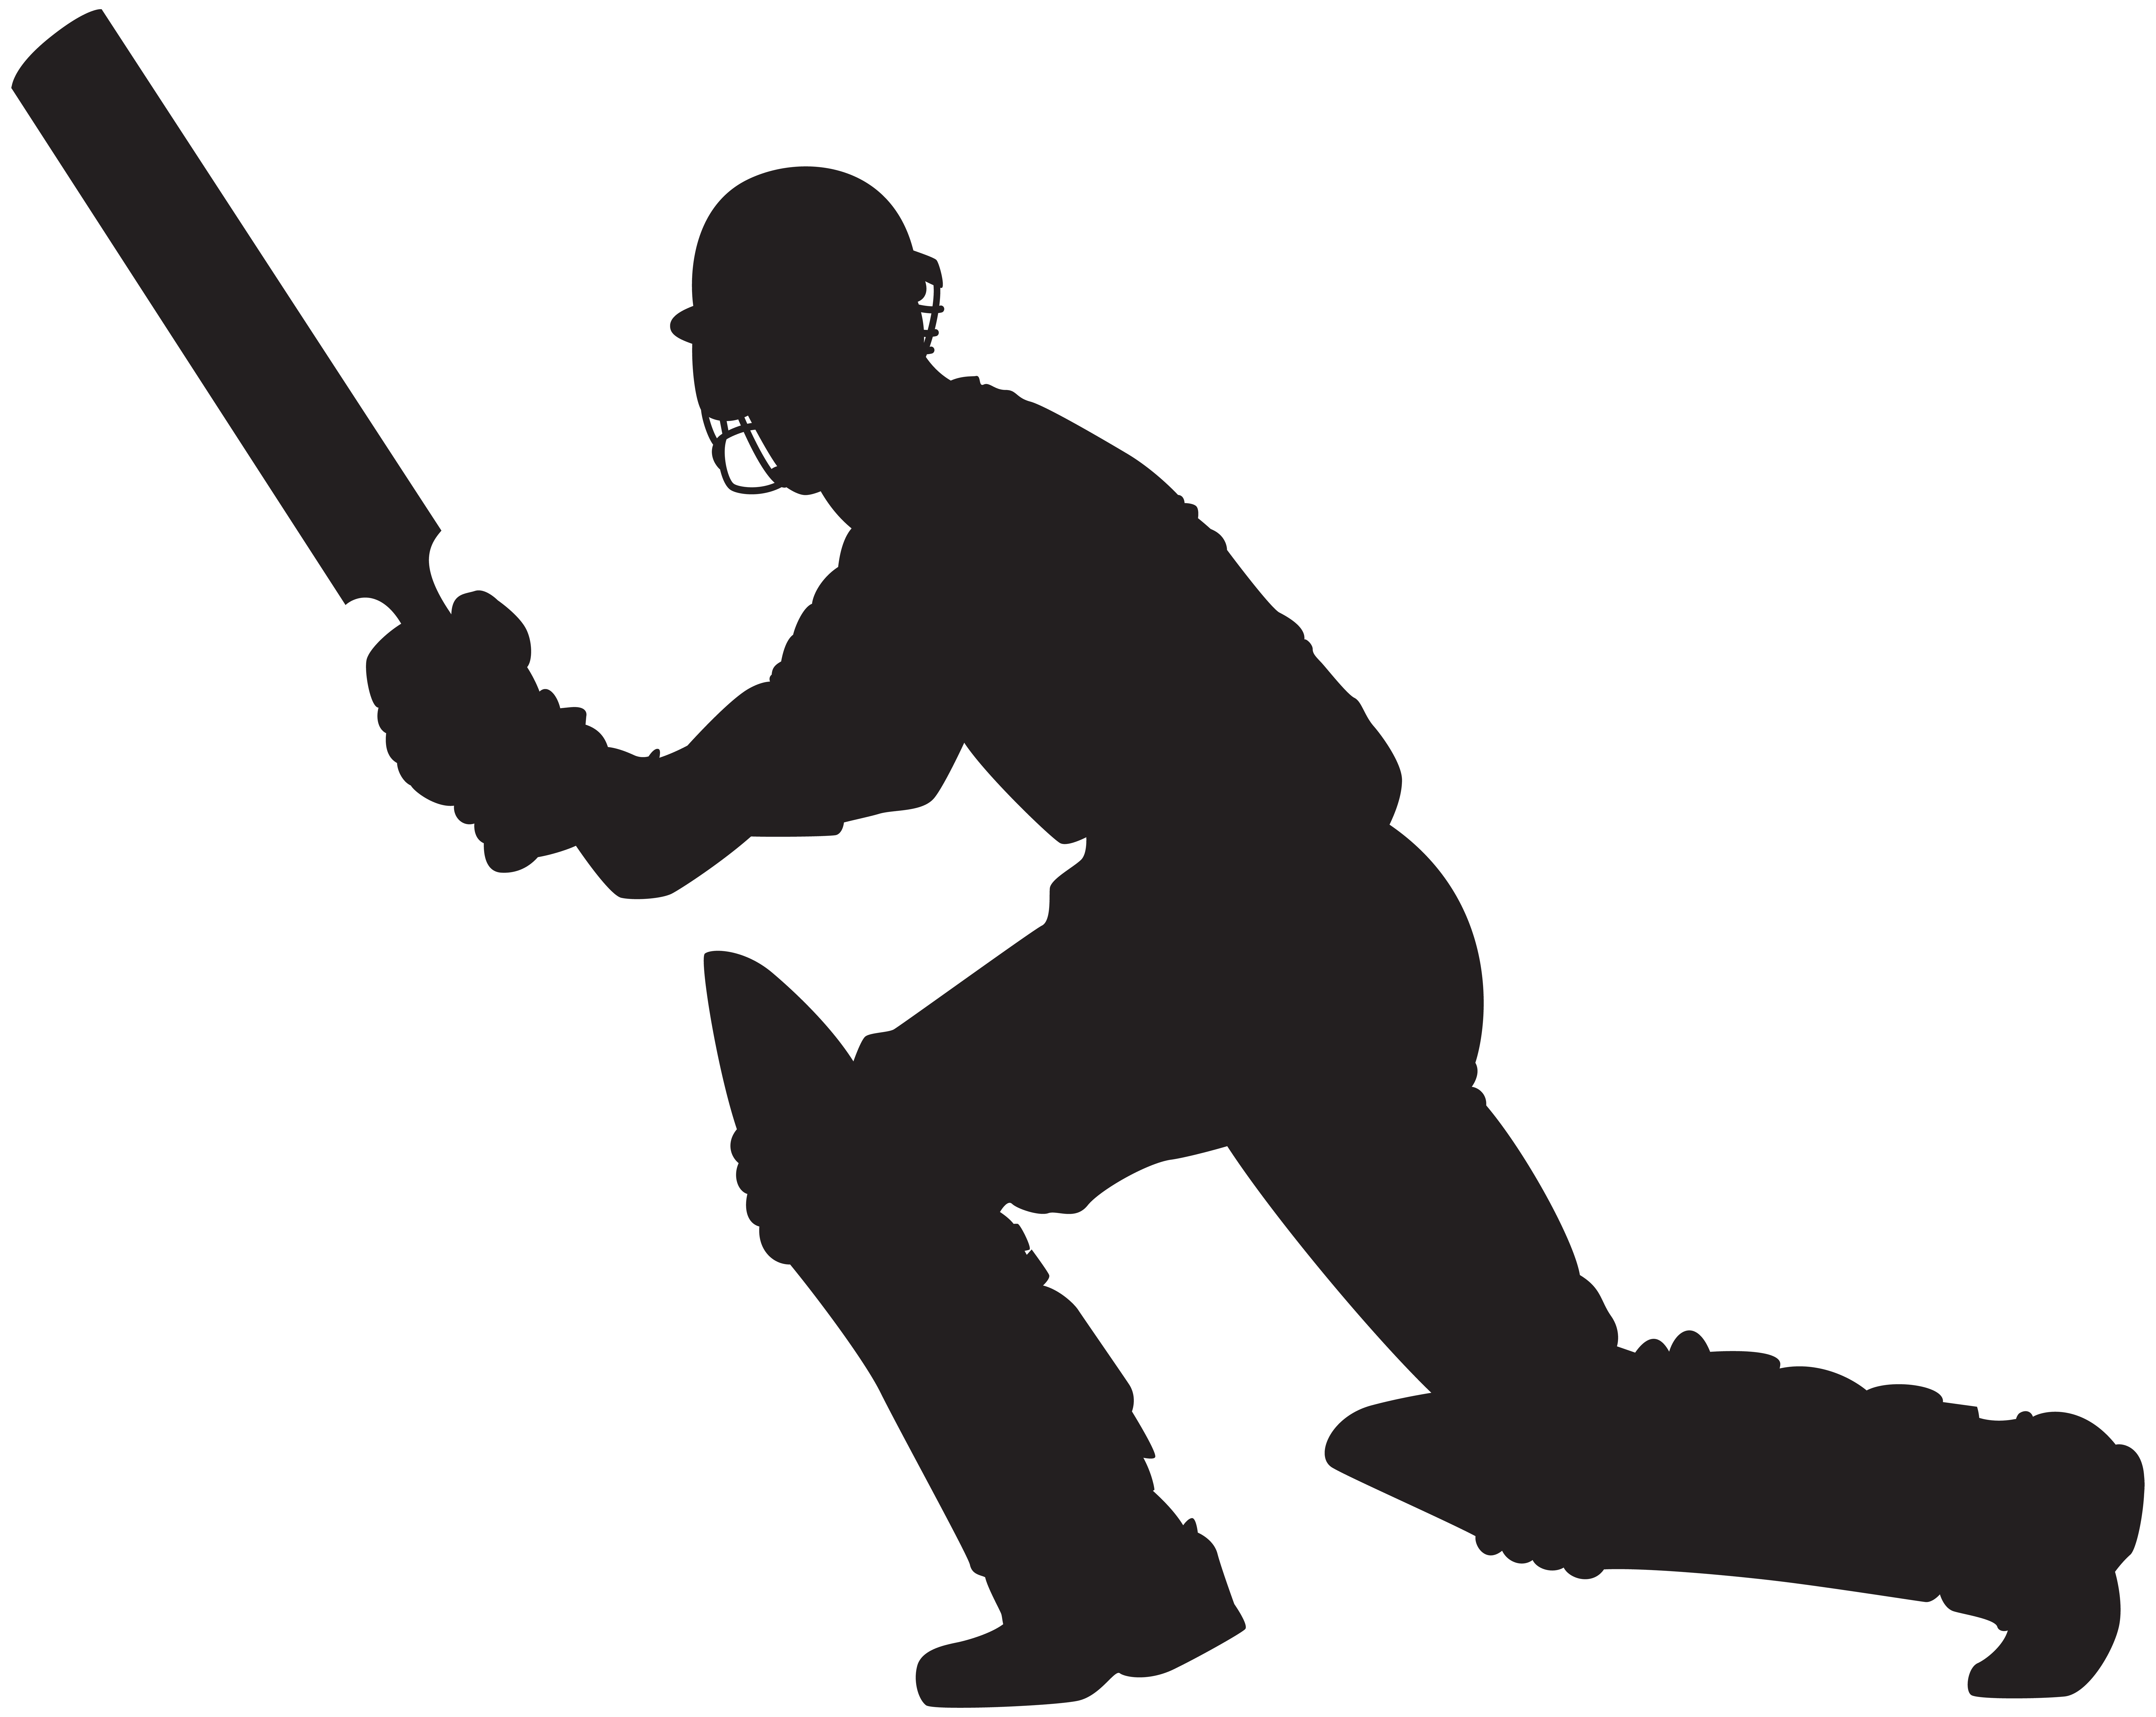 Vintage baseball player clipart image black and white Baseball Bat Clipart ground - Free Clipart on Dumielauxepices.net image black and white